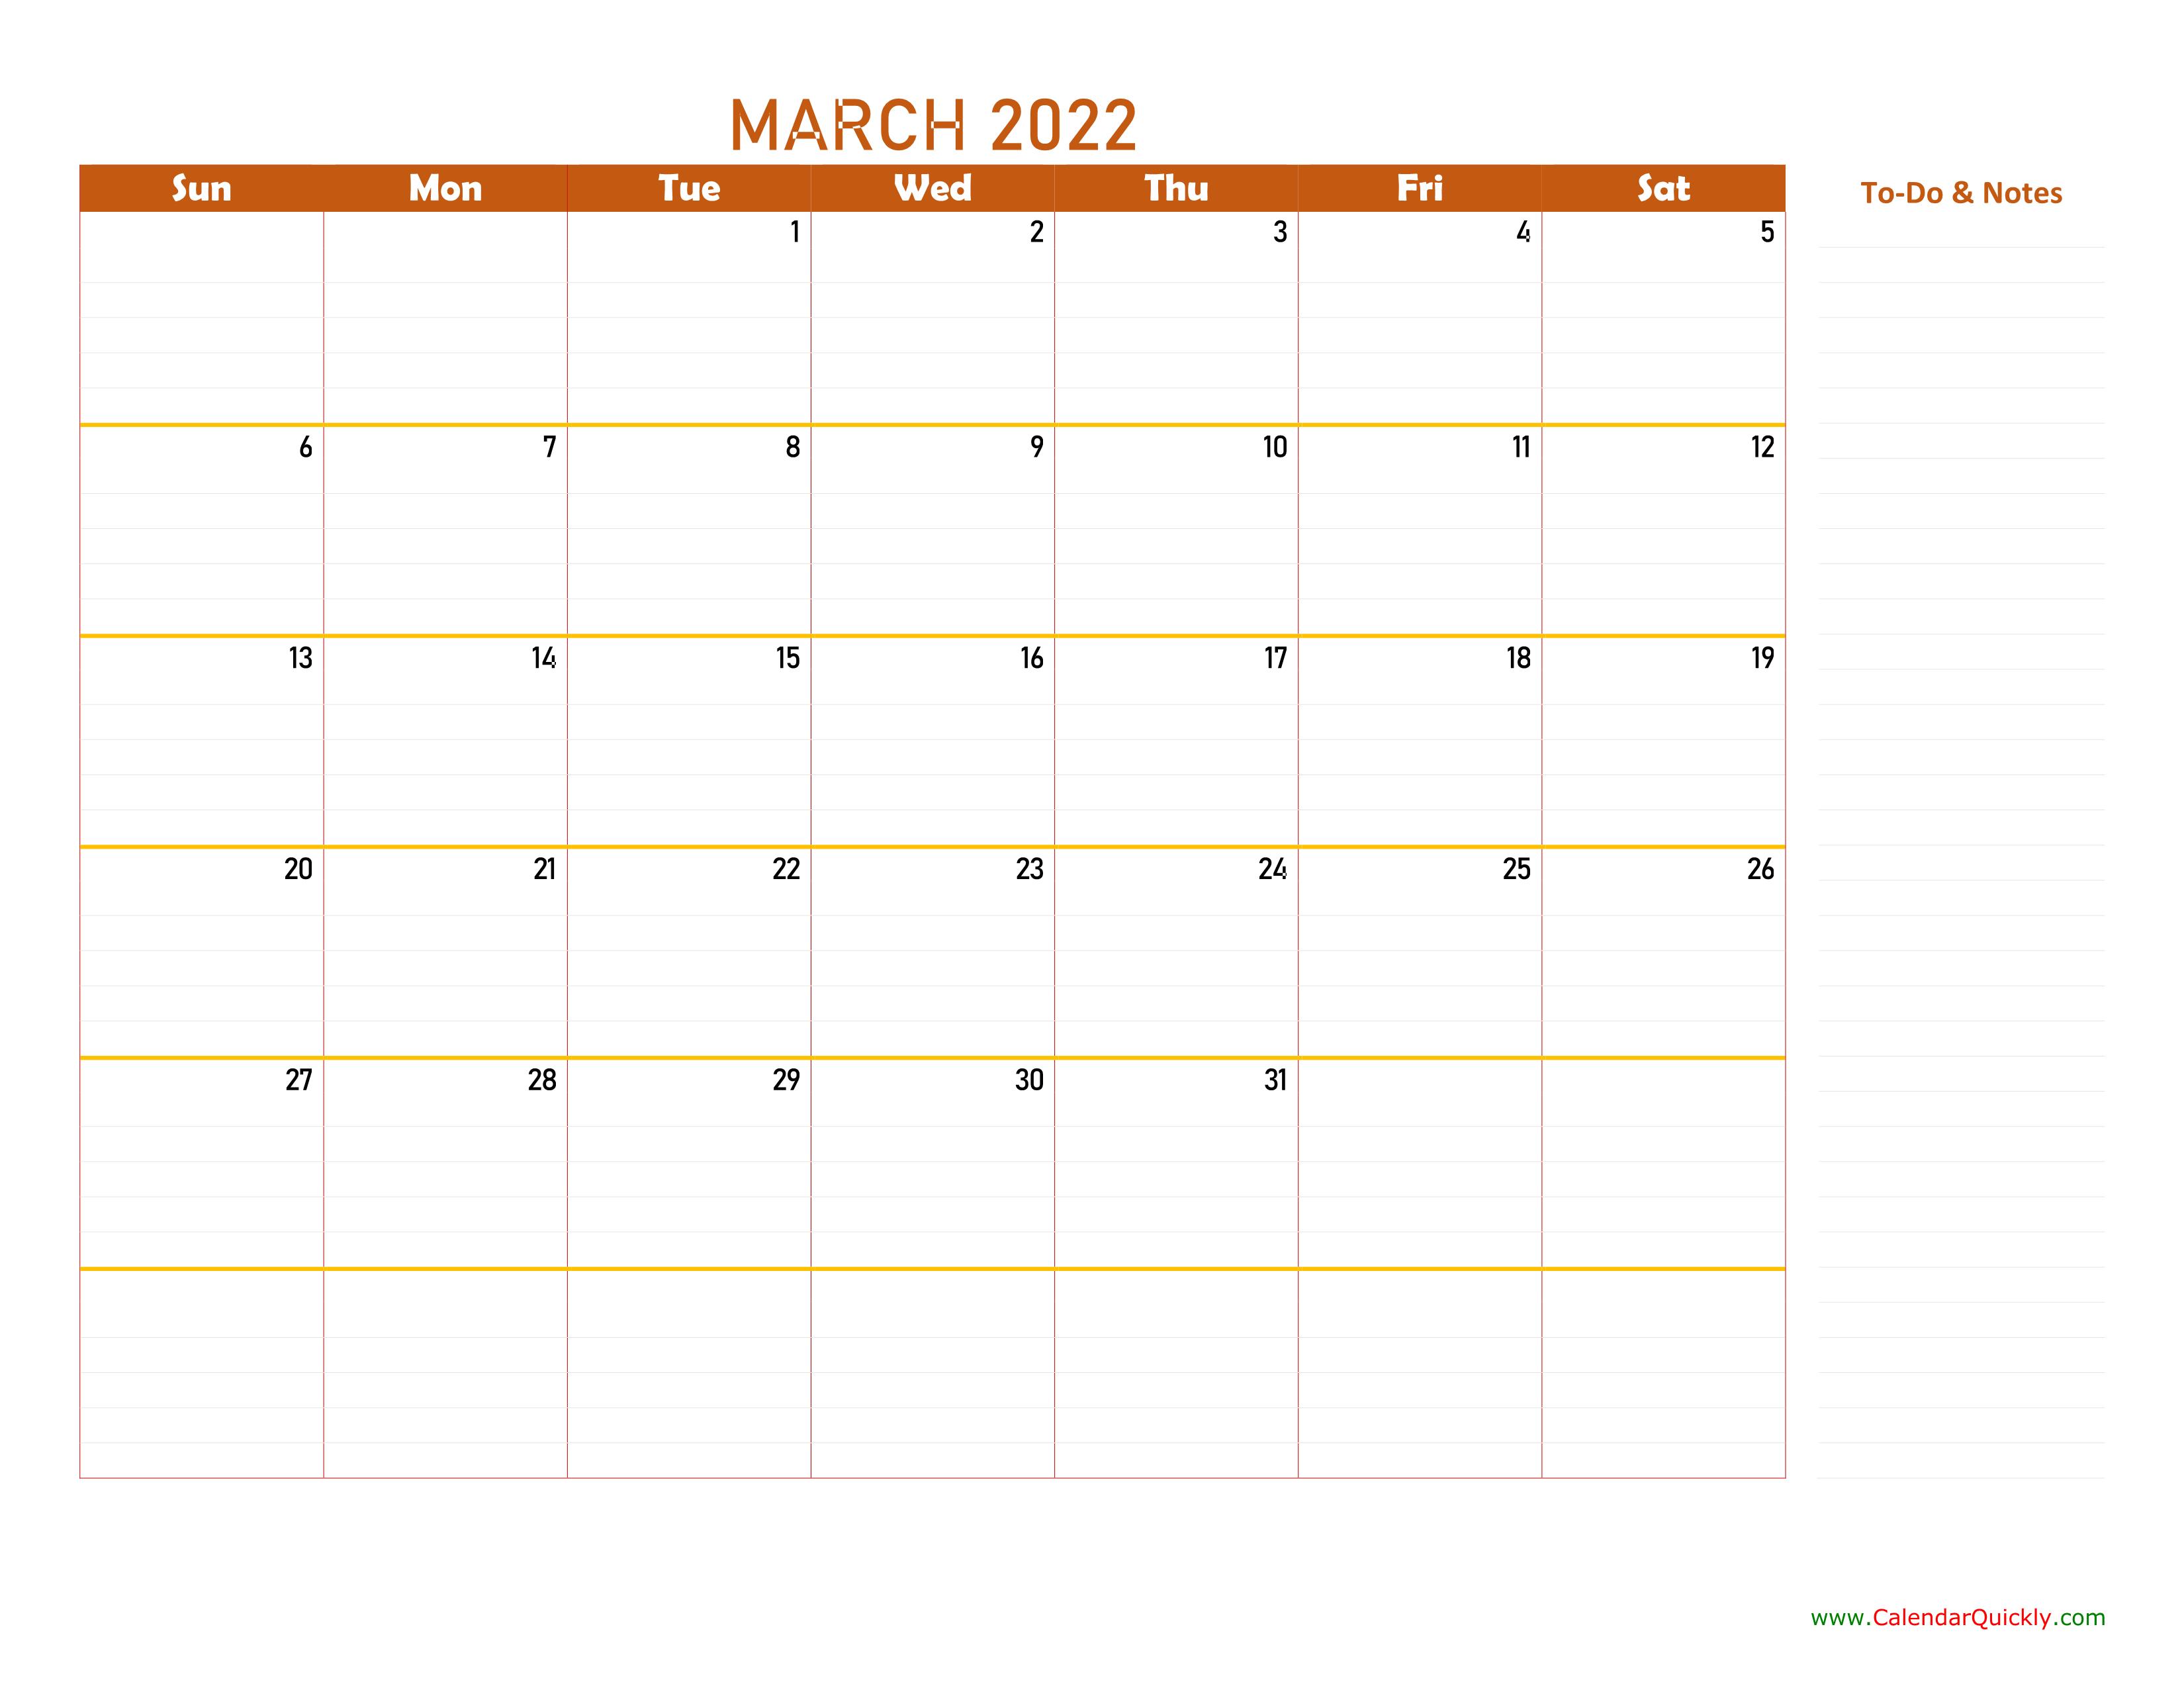 March 2022 Calendar | Calendar Quickly Regarding February March 2022 Calendar